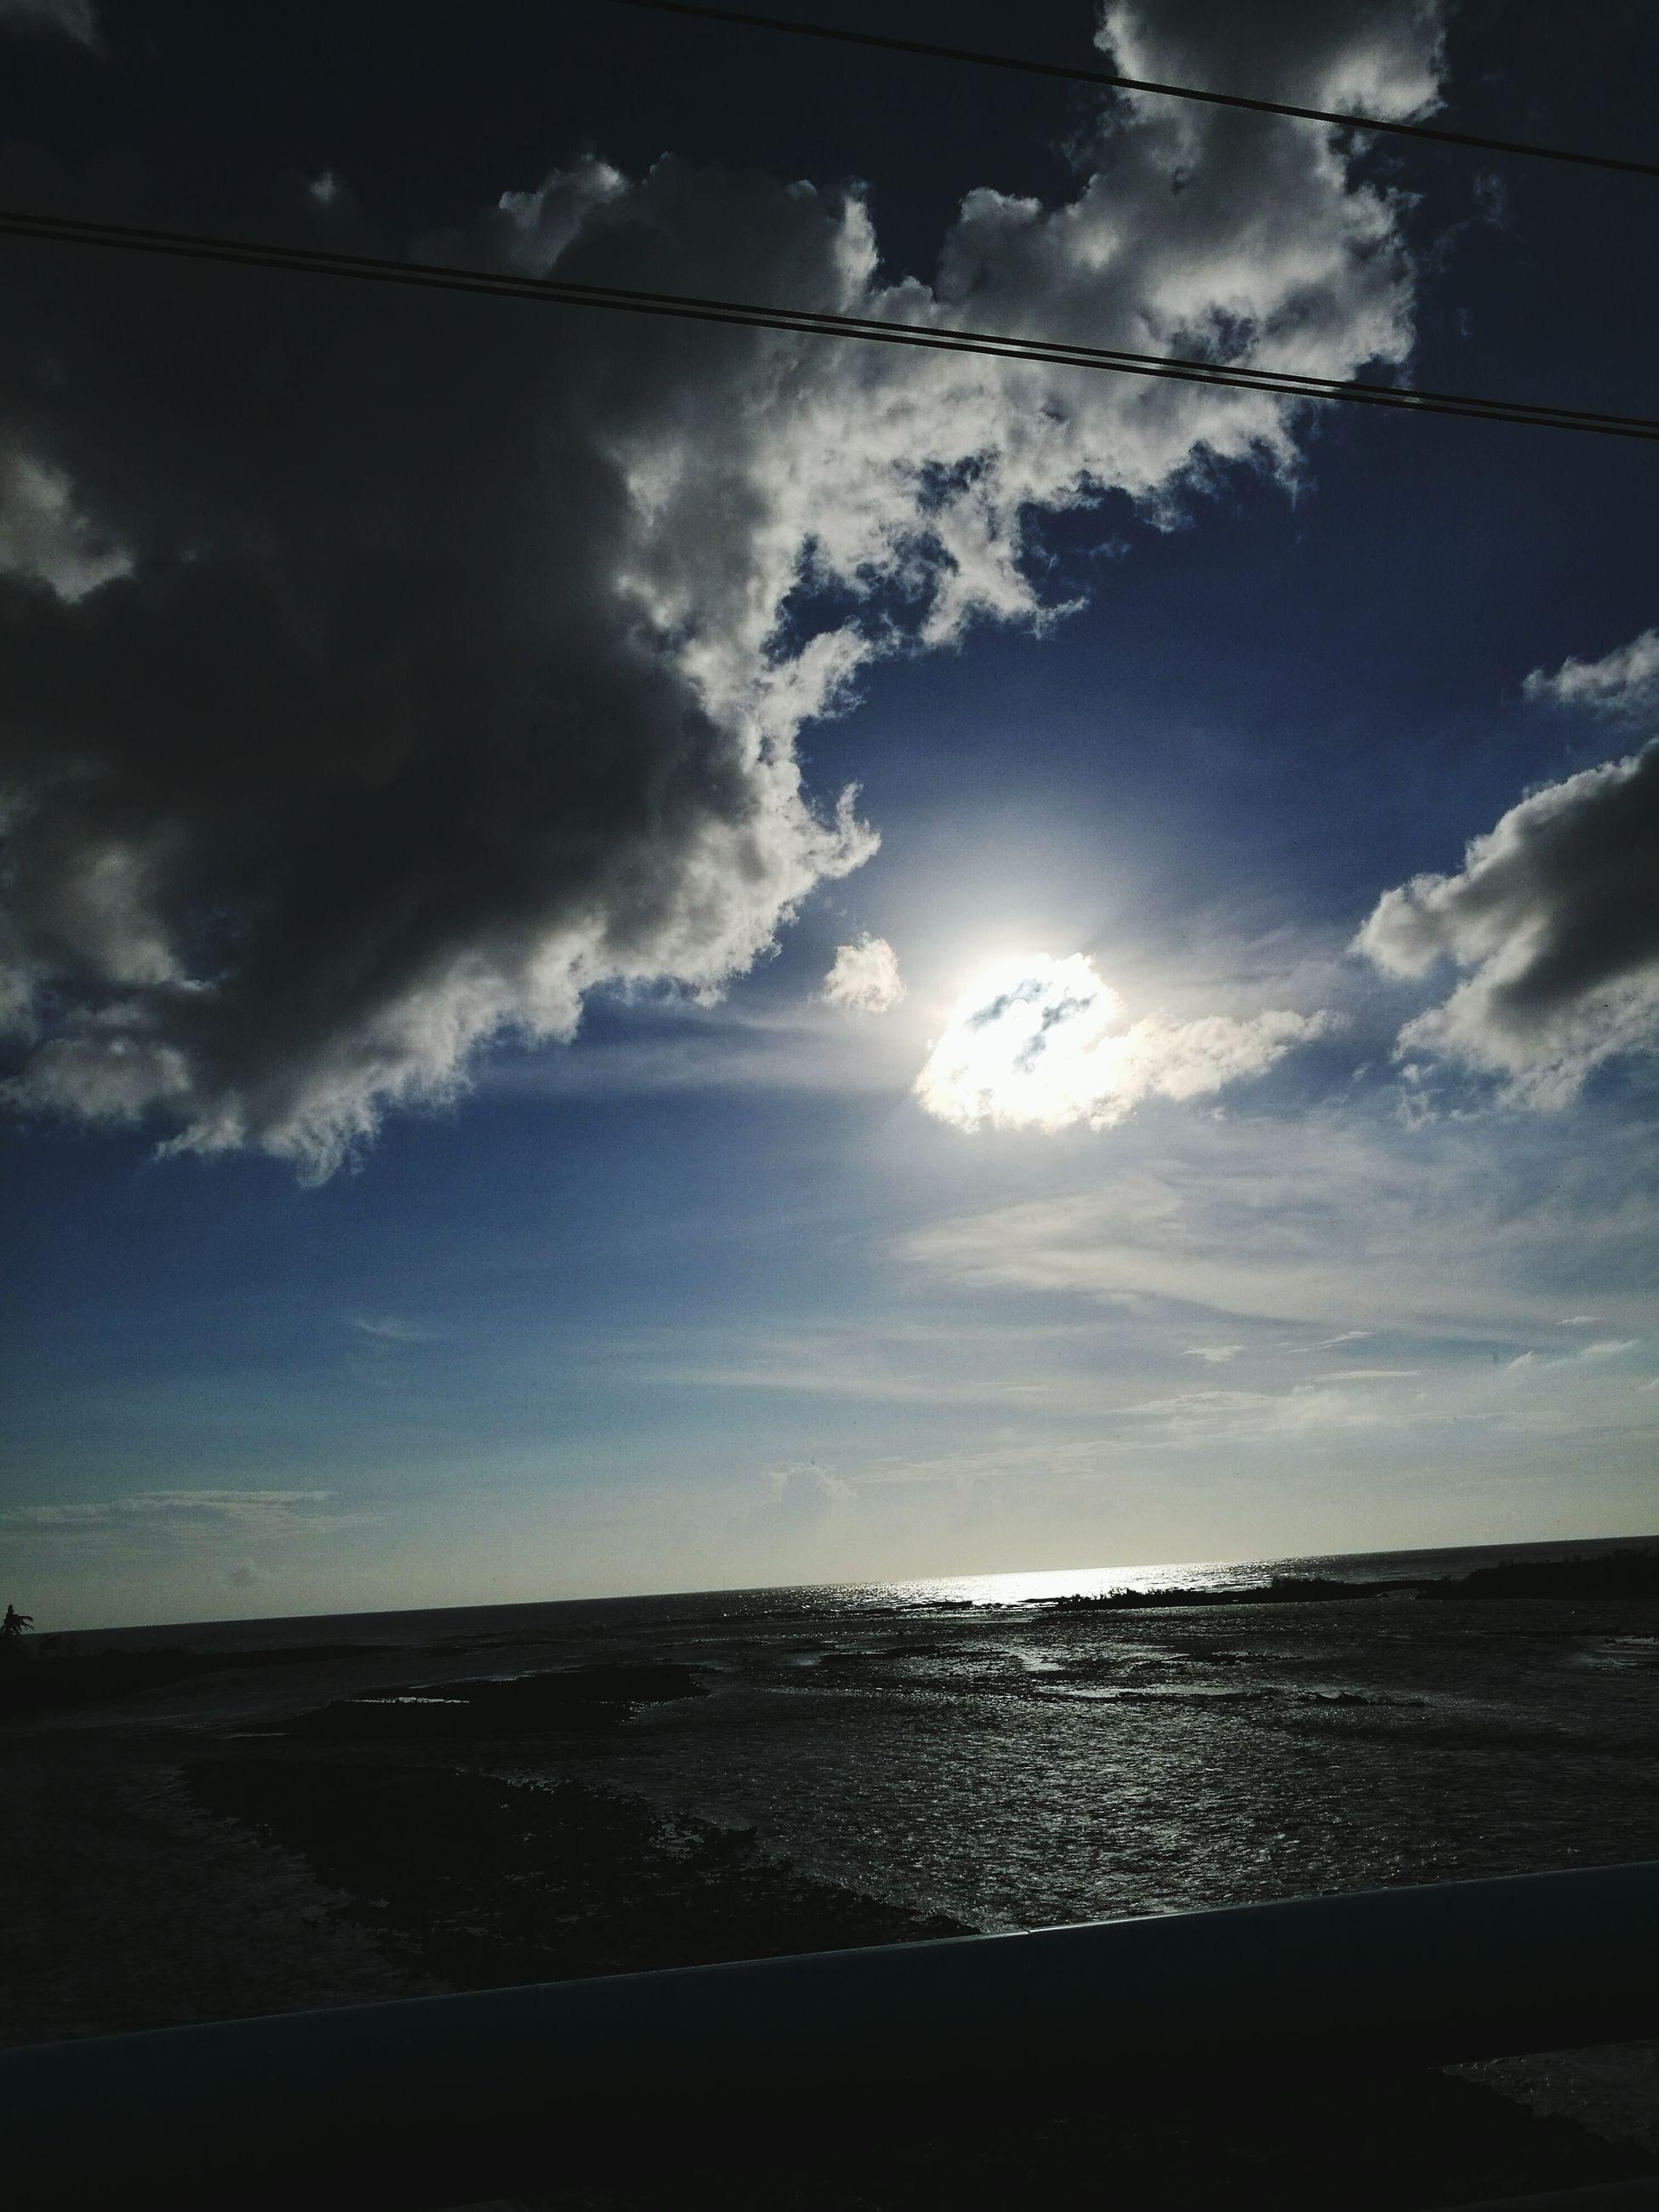 sea, water, tranquil scene, scenics, horizon over water, tranquility, beach, sky, beauty in nature, shore, calm, idyllic, nature, cloud - sky, coastline, cloud, ocean, sun, non-urban scene, tourism, outdoors, blue, vacations, seascape, remote, no people, majestic, cloudy, cloudscape